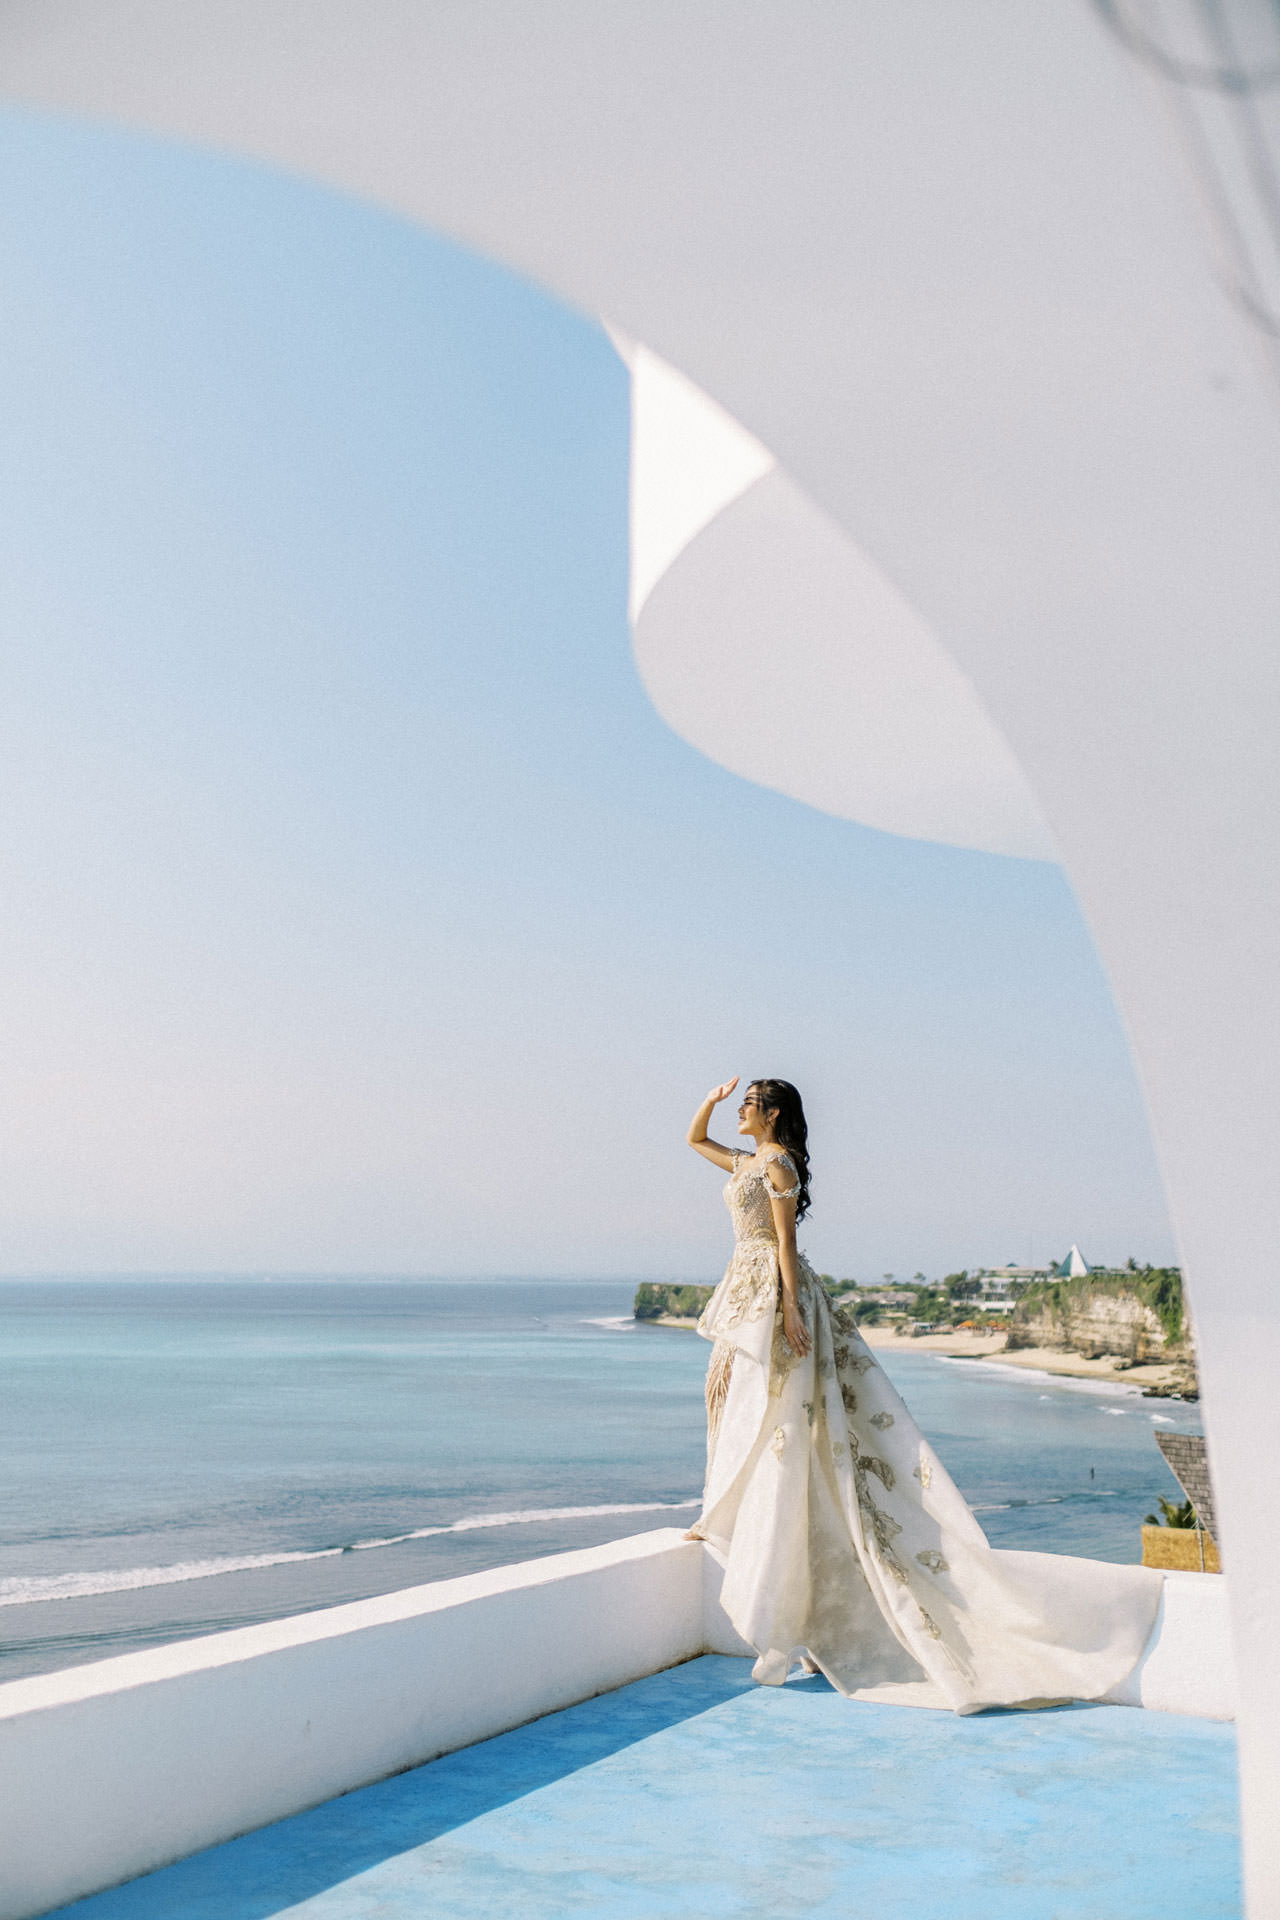 Glam Santorini Prewedding at Morabito Art Cliff 4